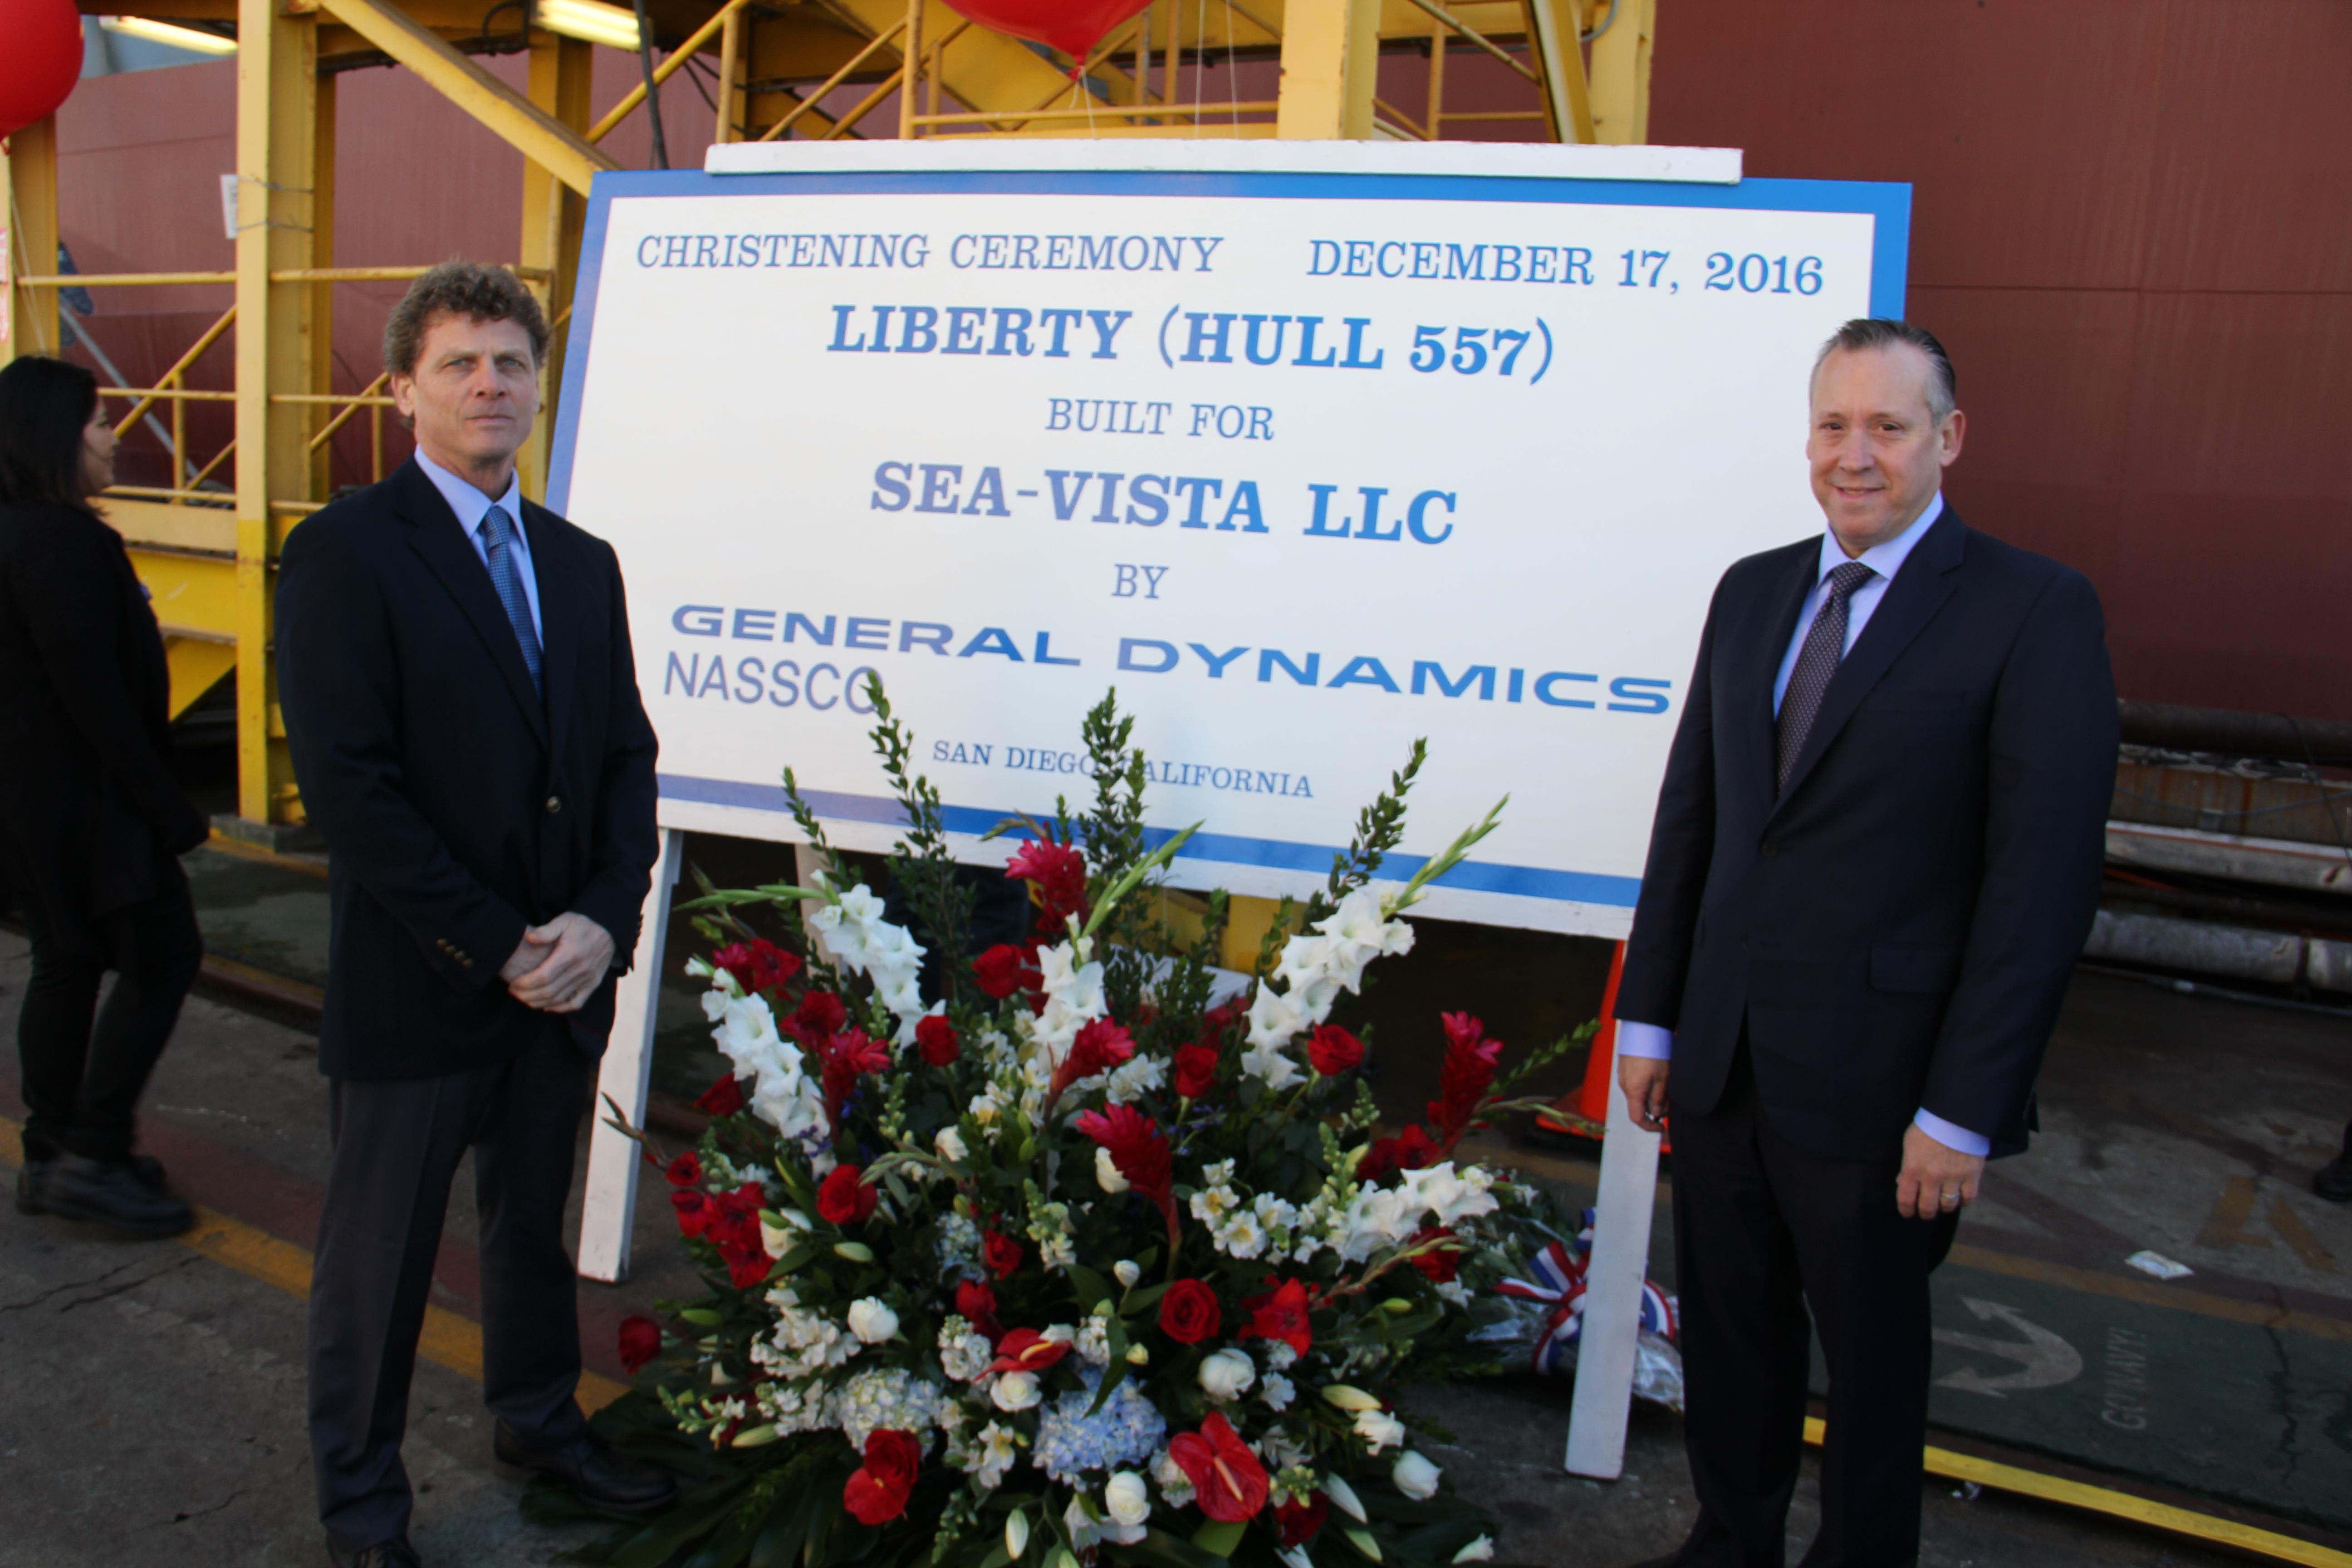 12-17-16 Liberty Hull 557 Christening (95)